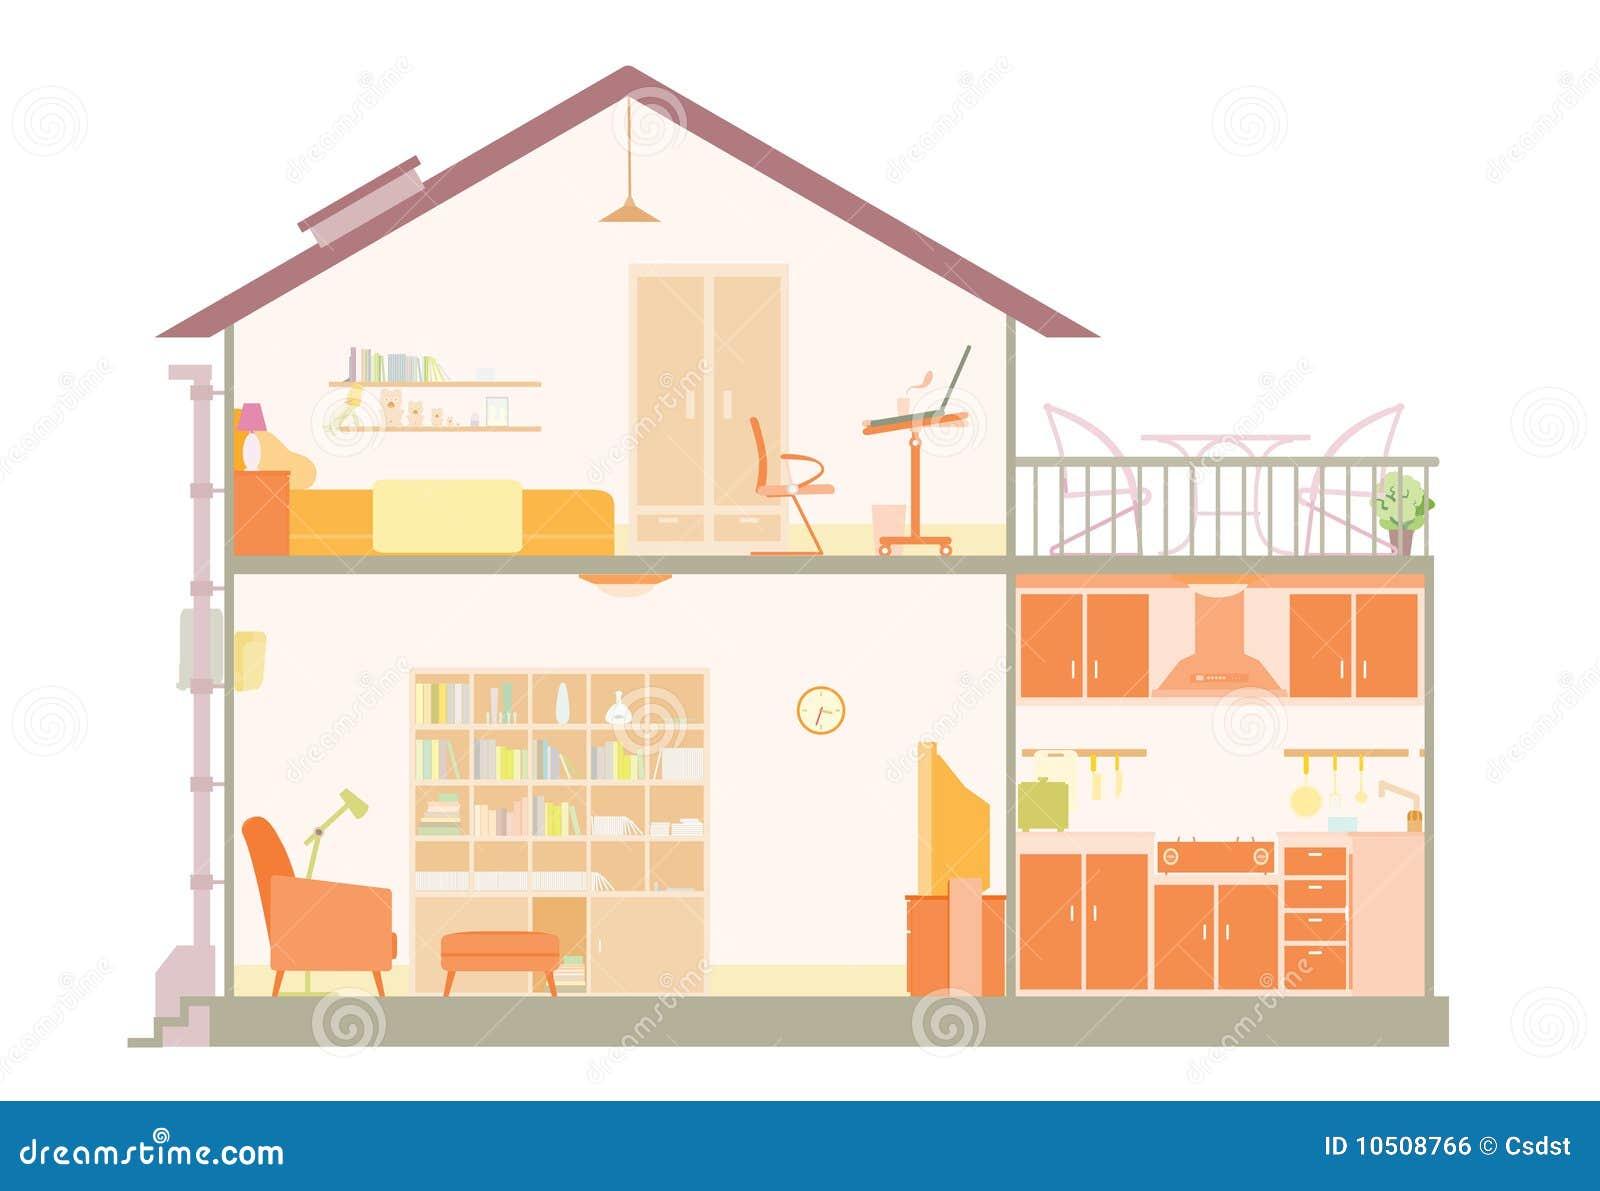 Haus plan lizenzfreies stockbild bild 10508766 for Haus plan